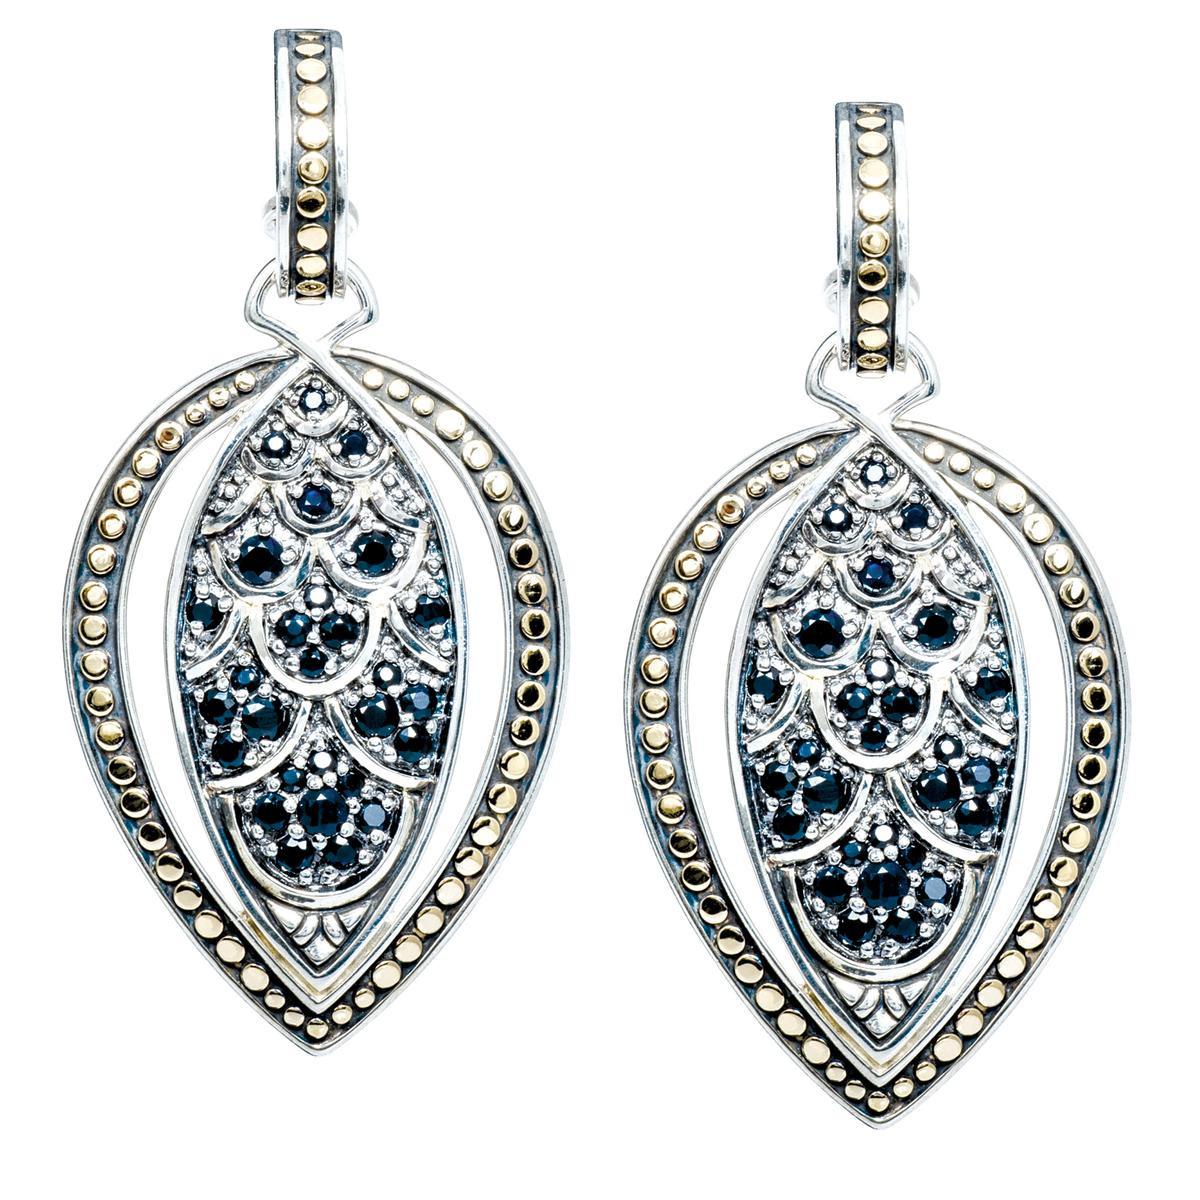 Vintage John Hardy Black Diamond Naga Earrings